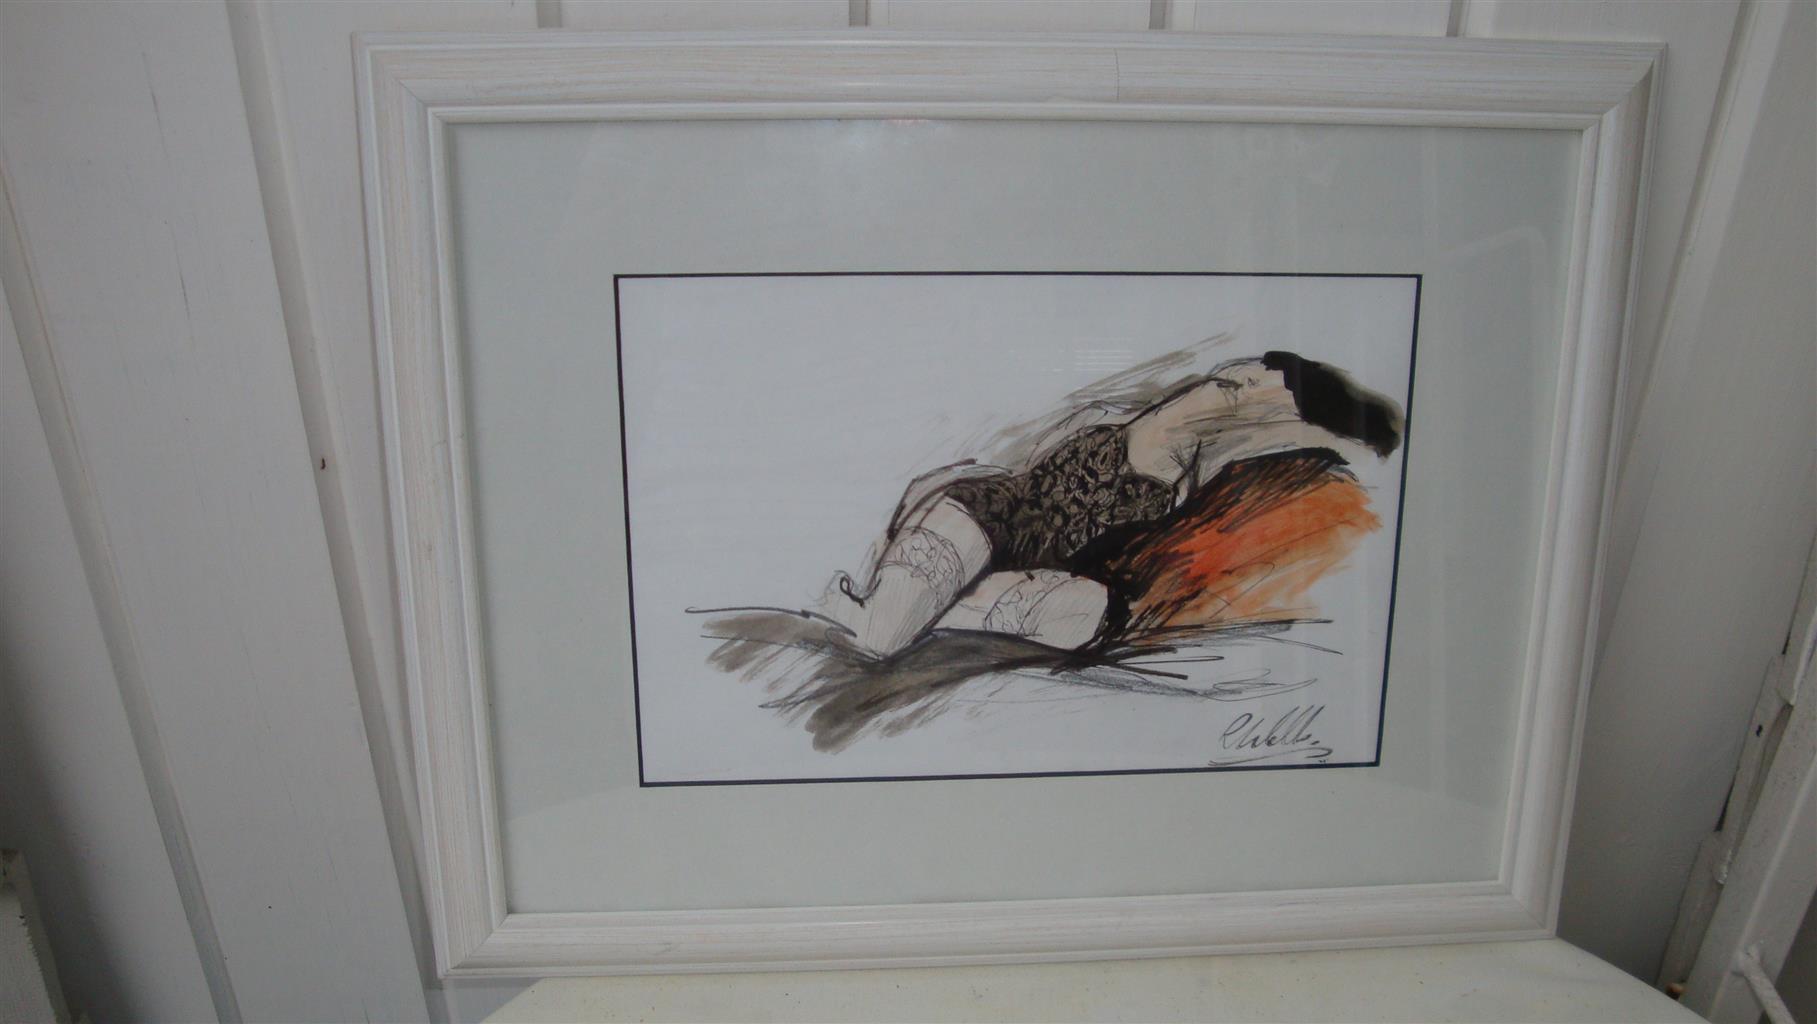 Affordable, original and framed art by Irish artist Ros Webb - reclining girl